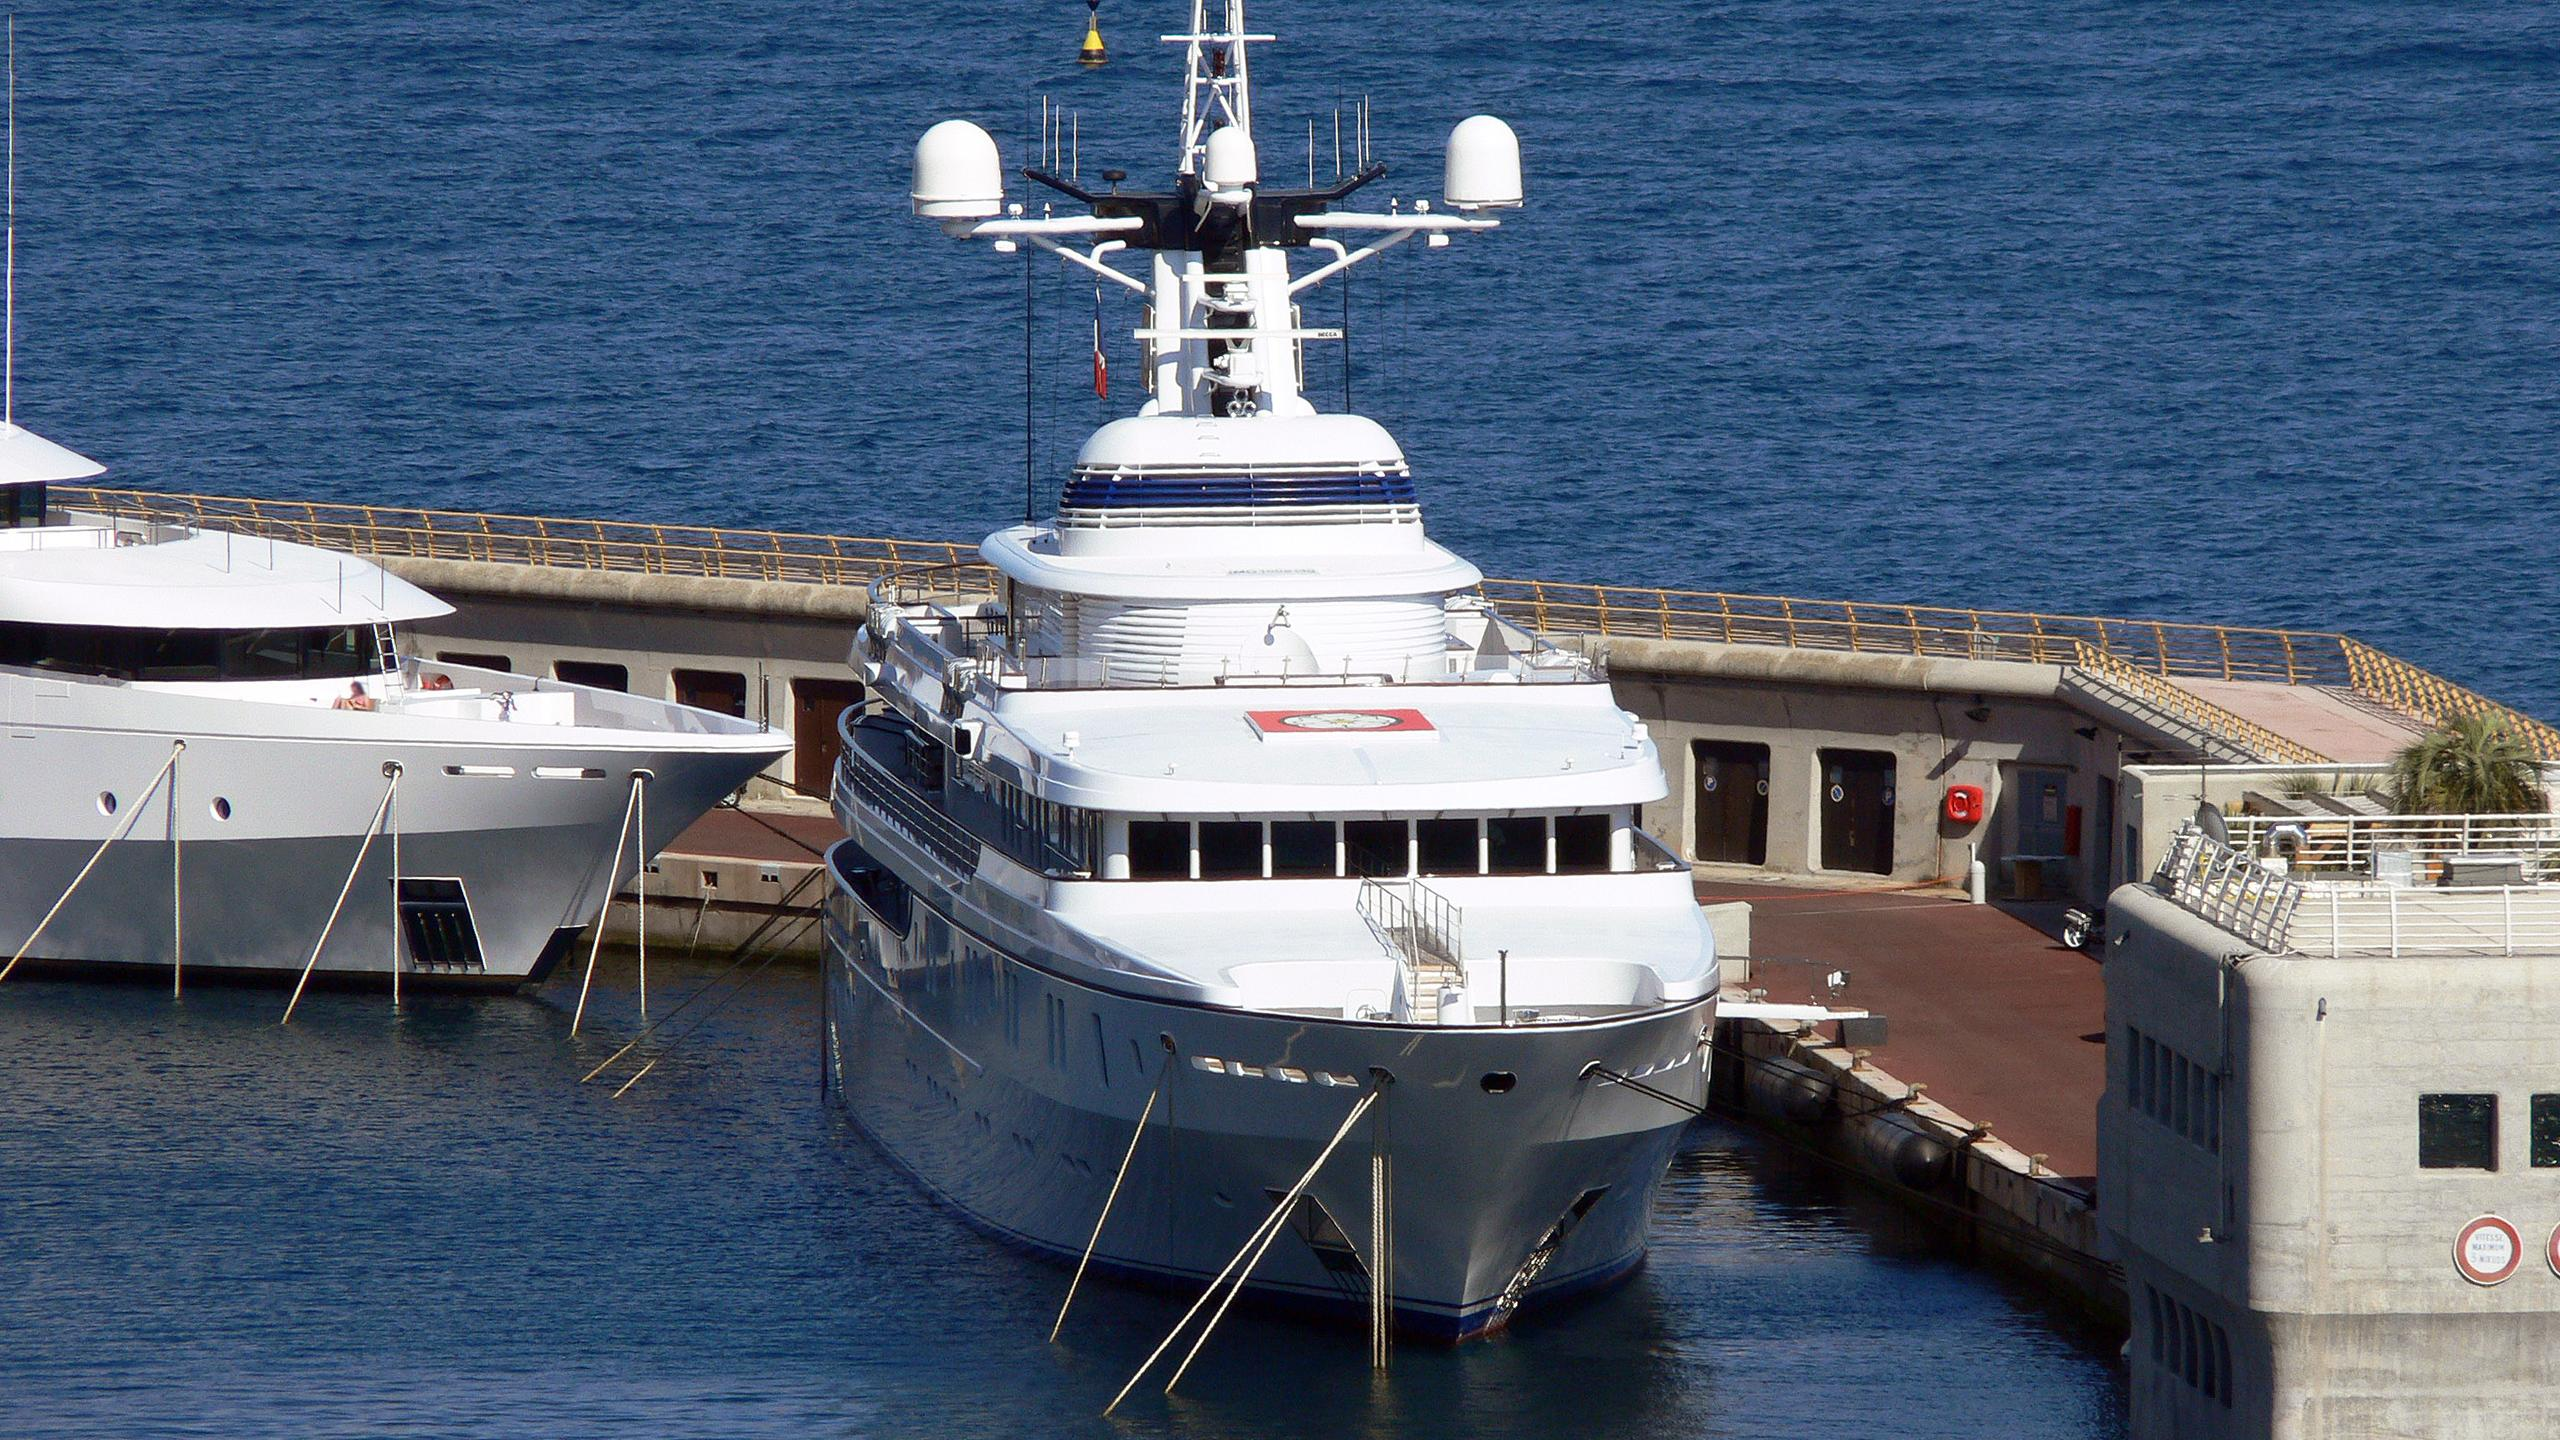 white-rose-of-drachs-motor-yacht-peterswerft-kusch-2004-65m-bow